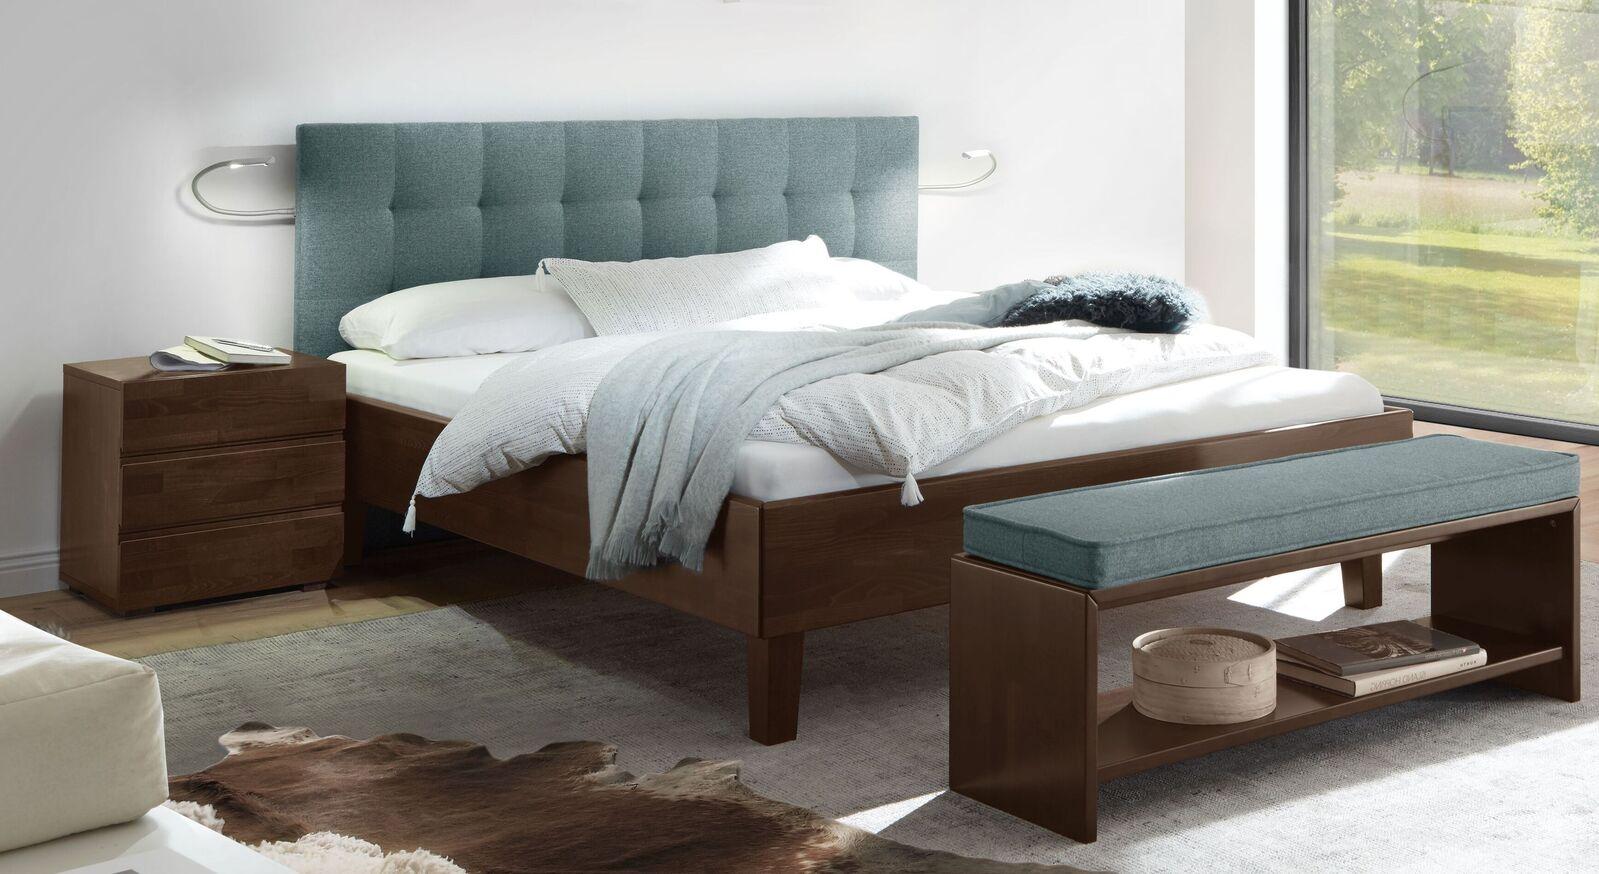 Bett Fucino mit blaugrauem Stoffkopfteil